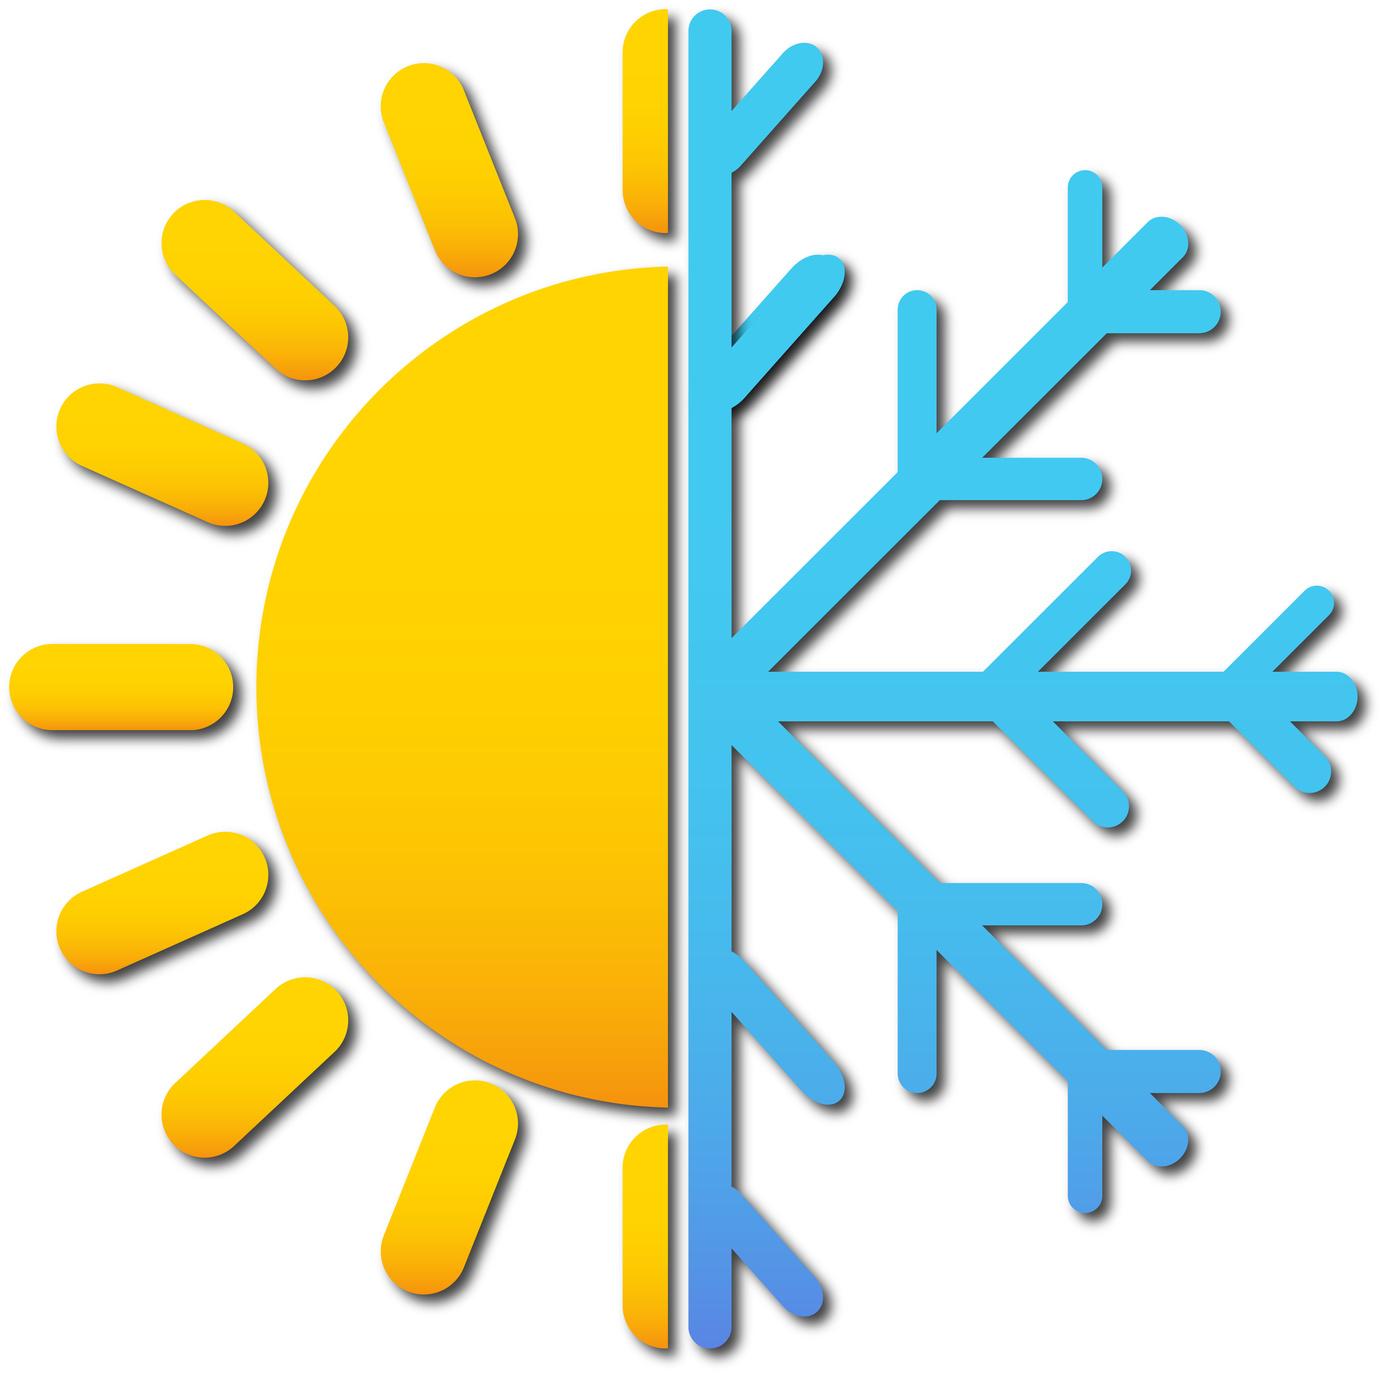 Half a sun, Half a snowflake